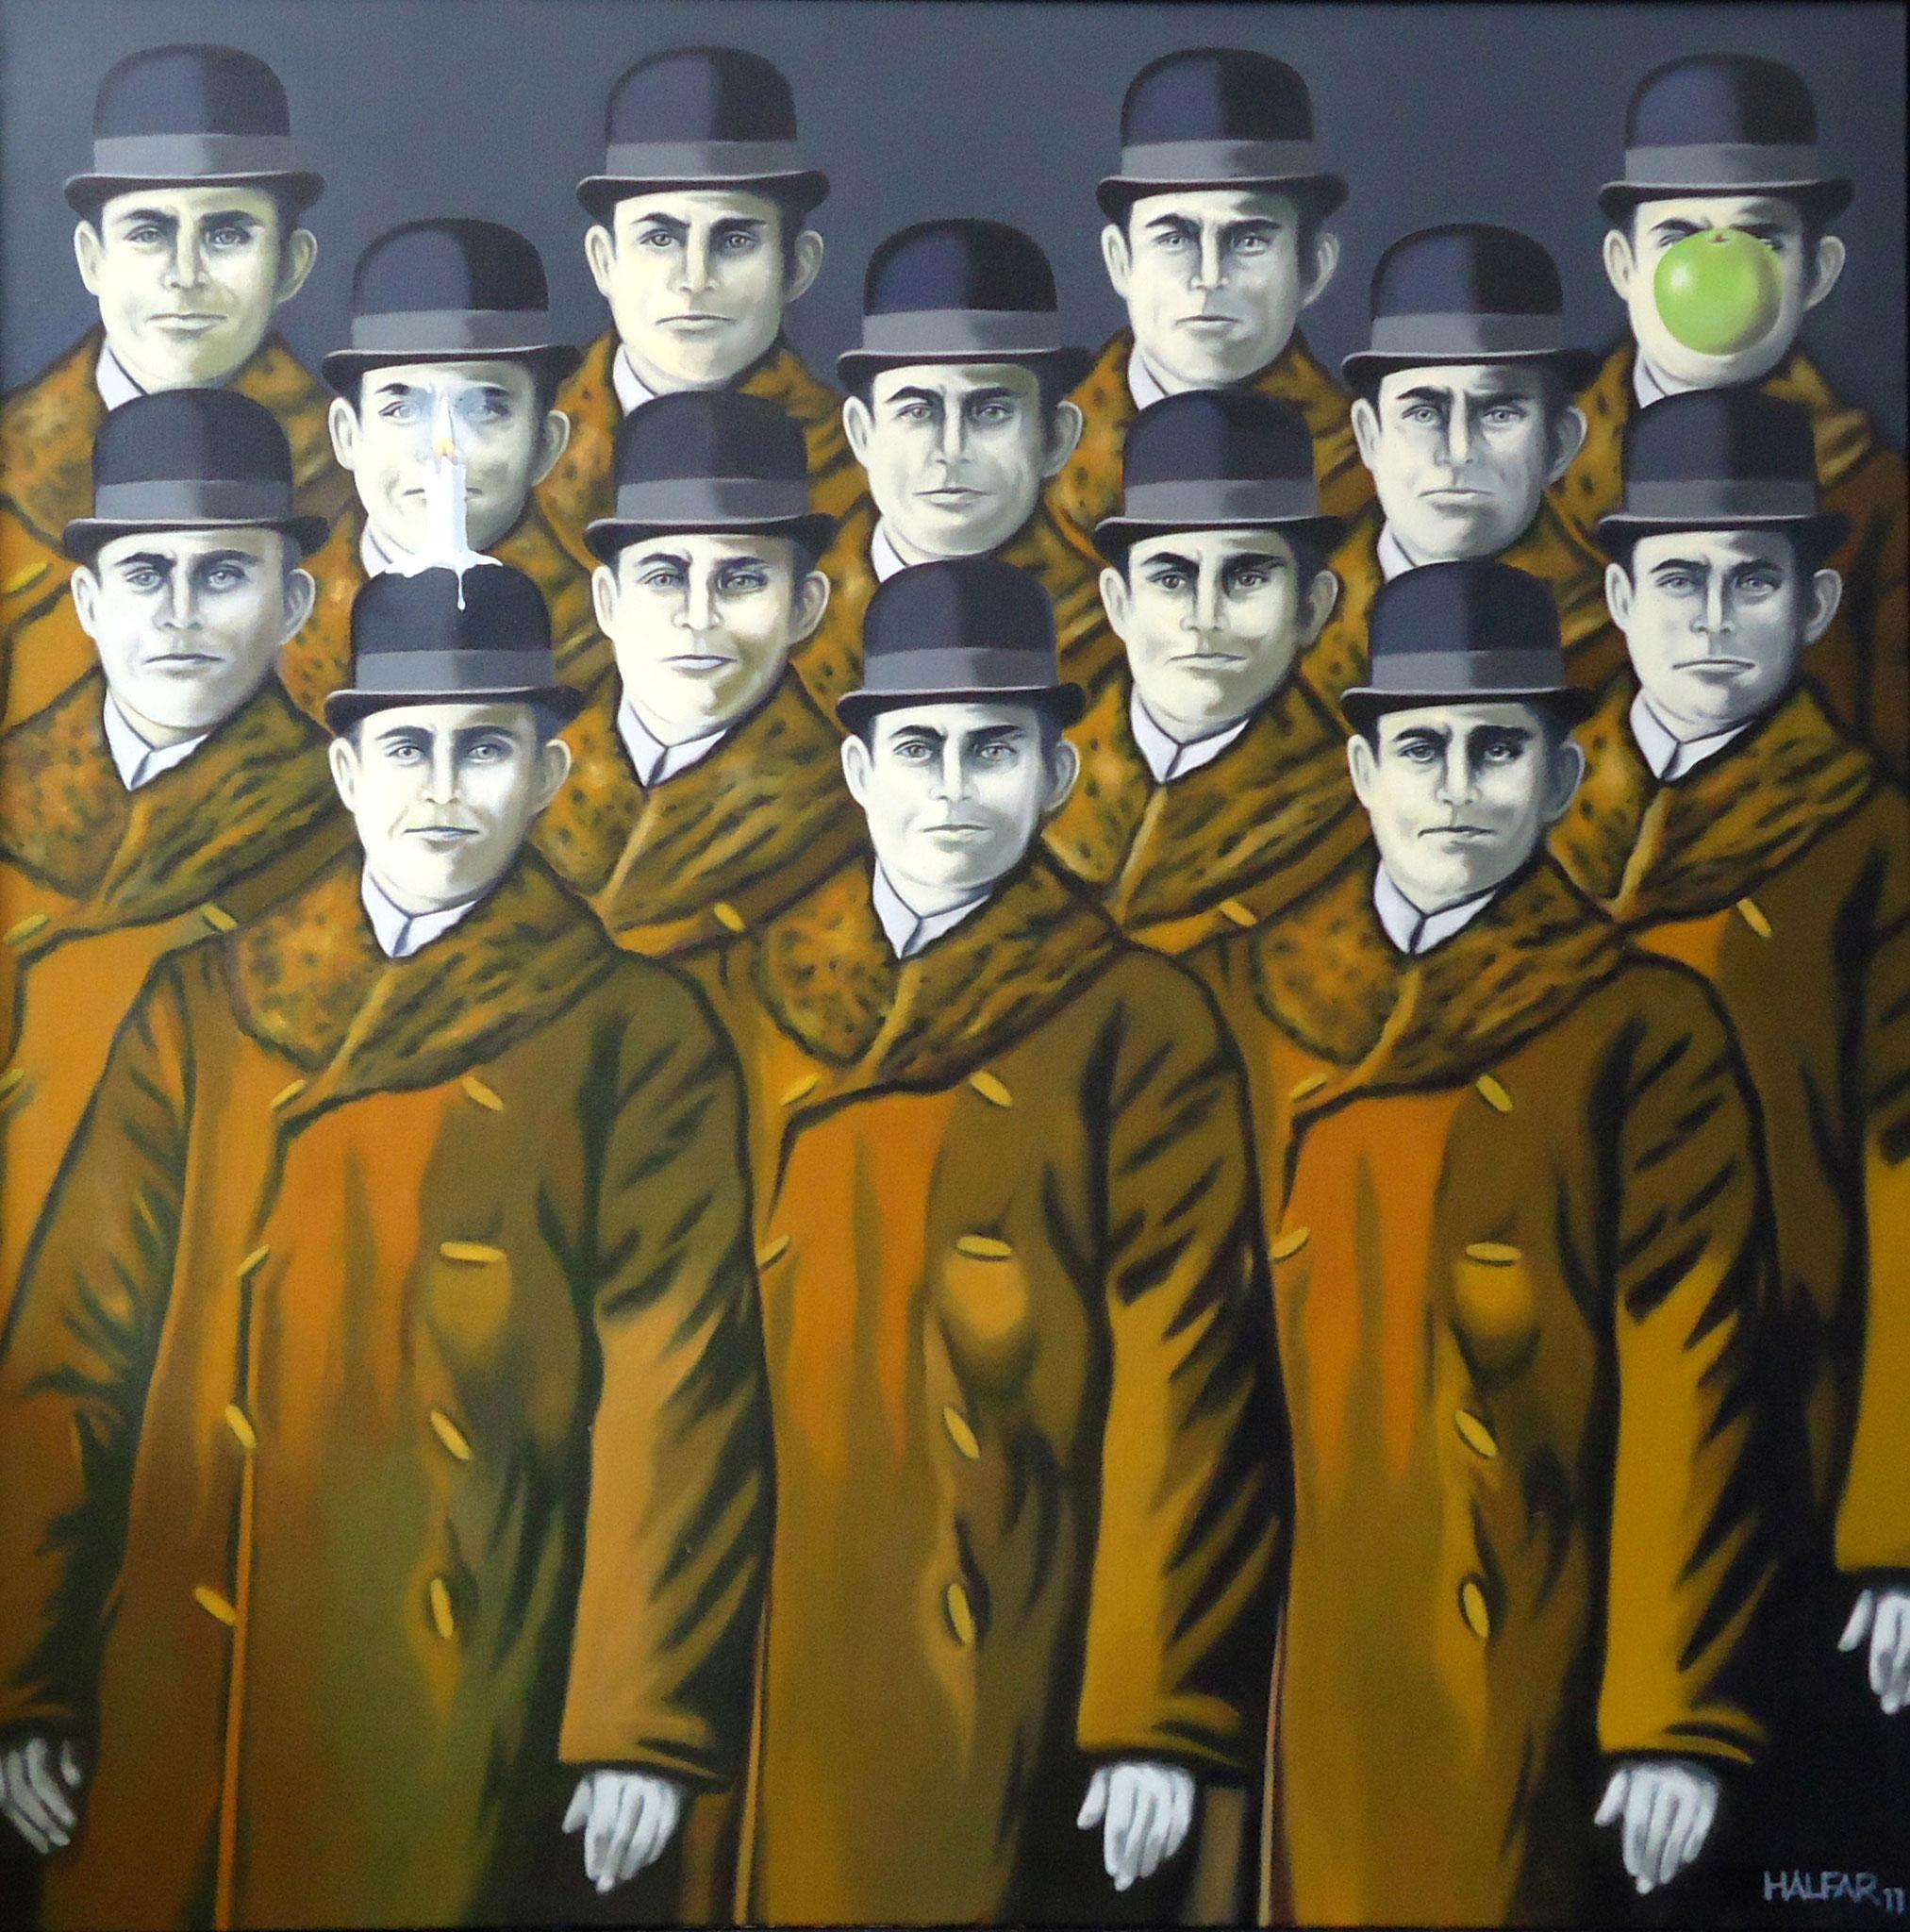 ' Hommage Renè Magritte ' Öl a. LW, 100 x 100 cm, 2011